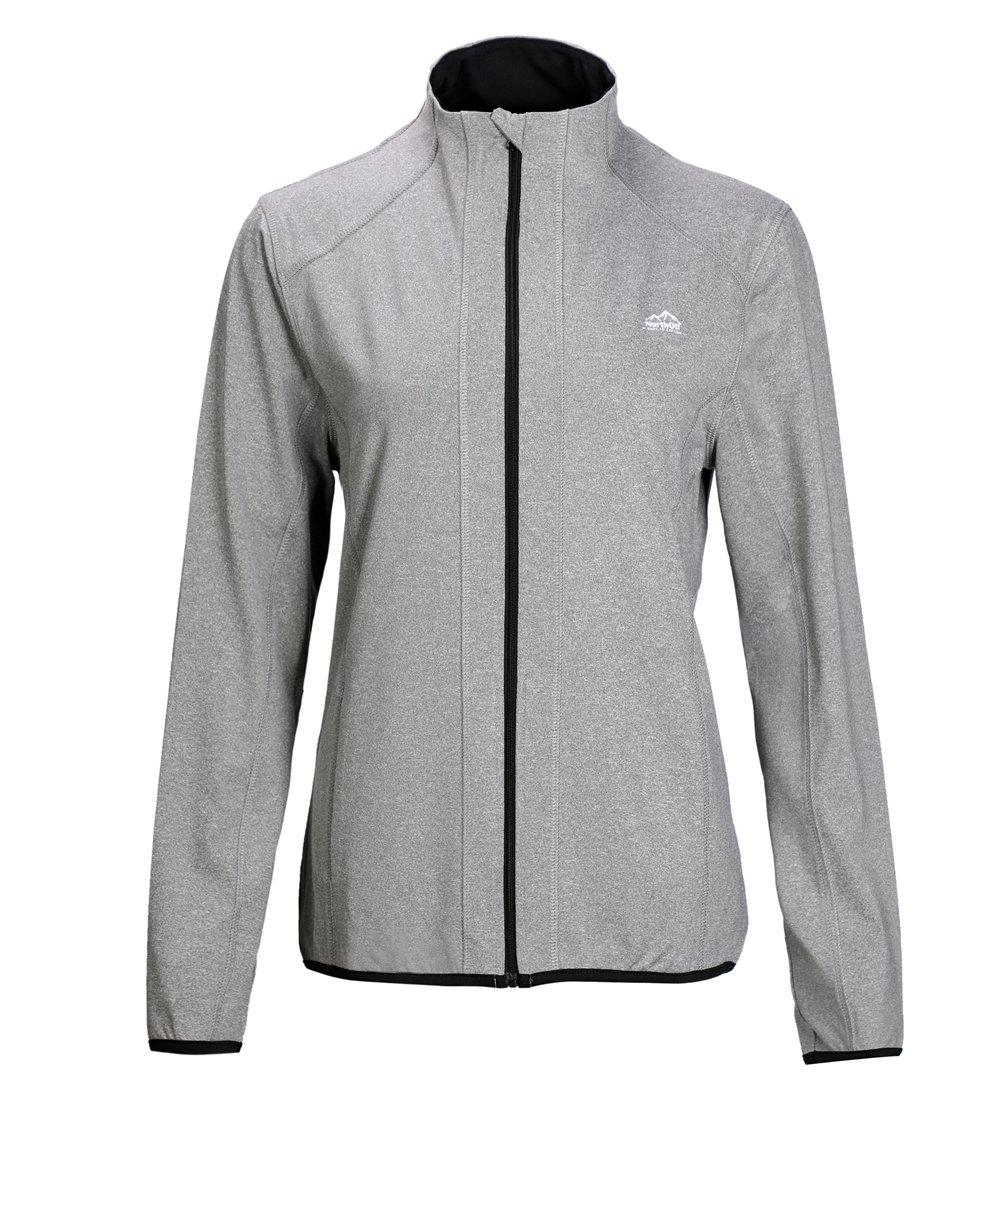 Dolcevida Women's Full Zip Long Sleeves Running Activewear Yoga Track Jackets (Grey, XL)